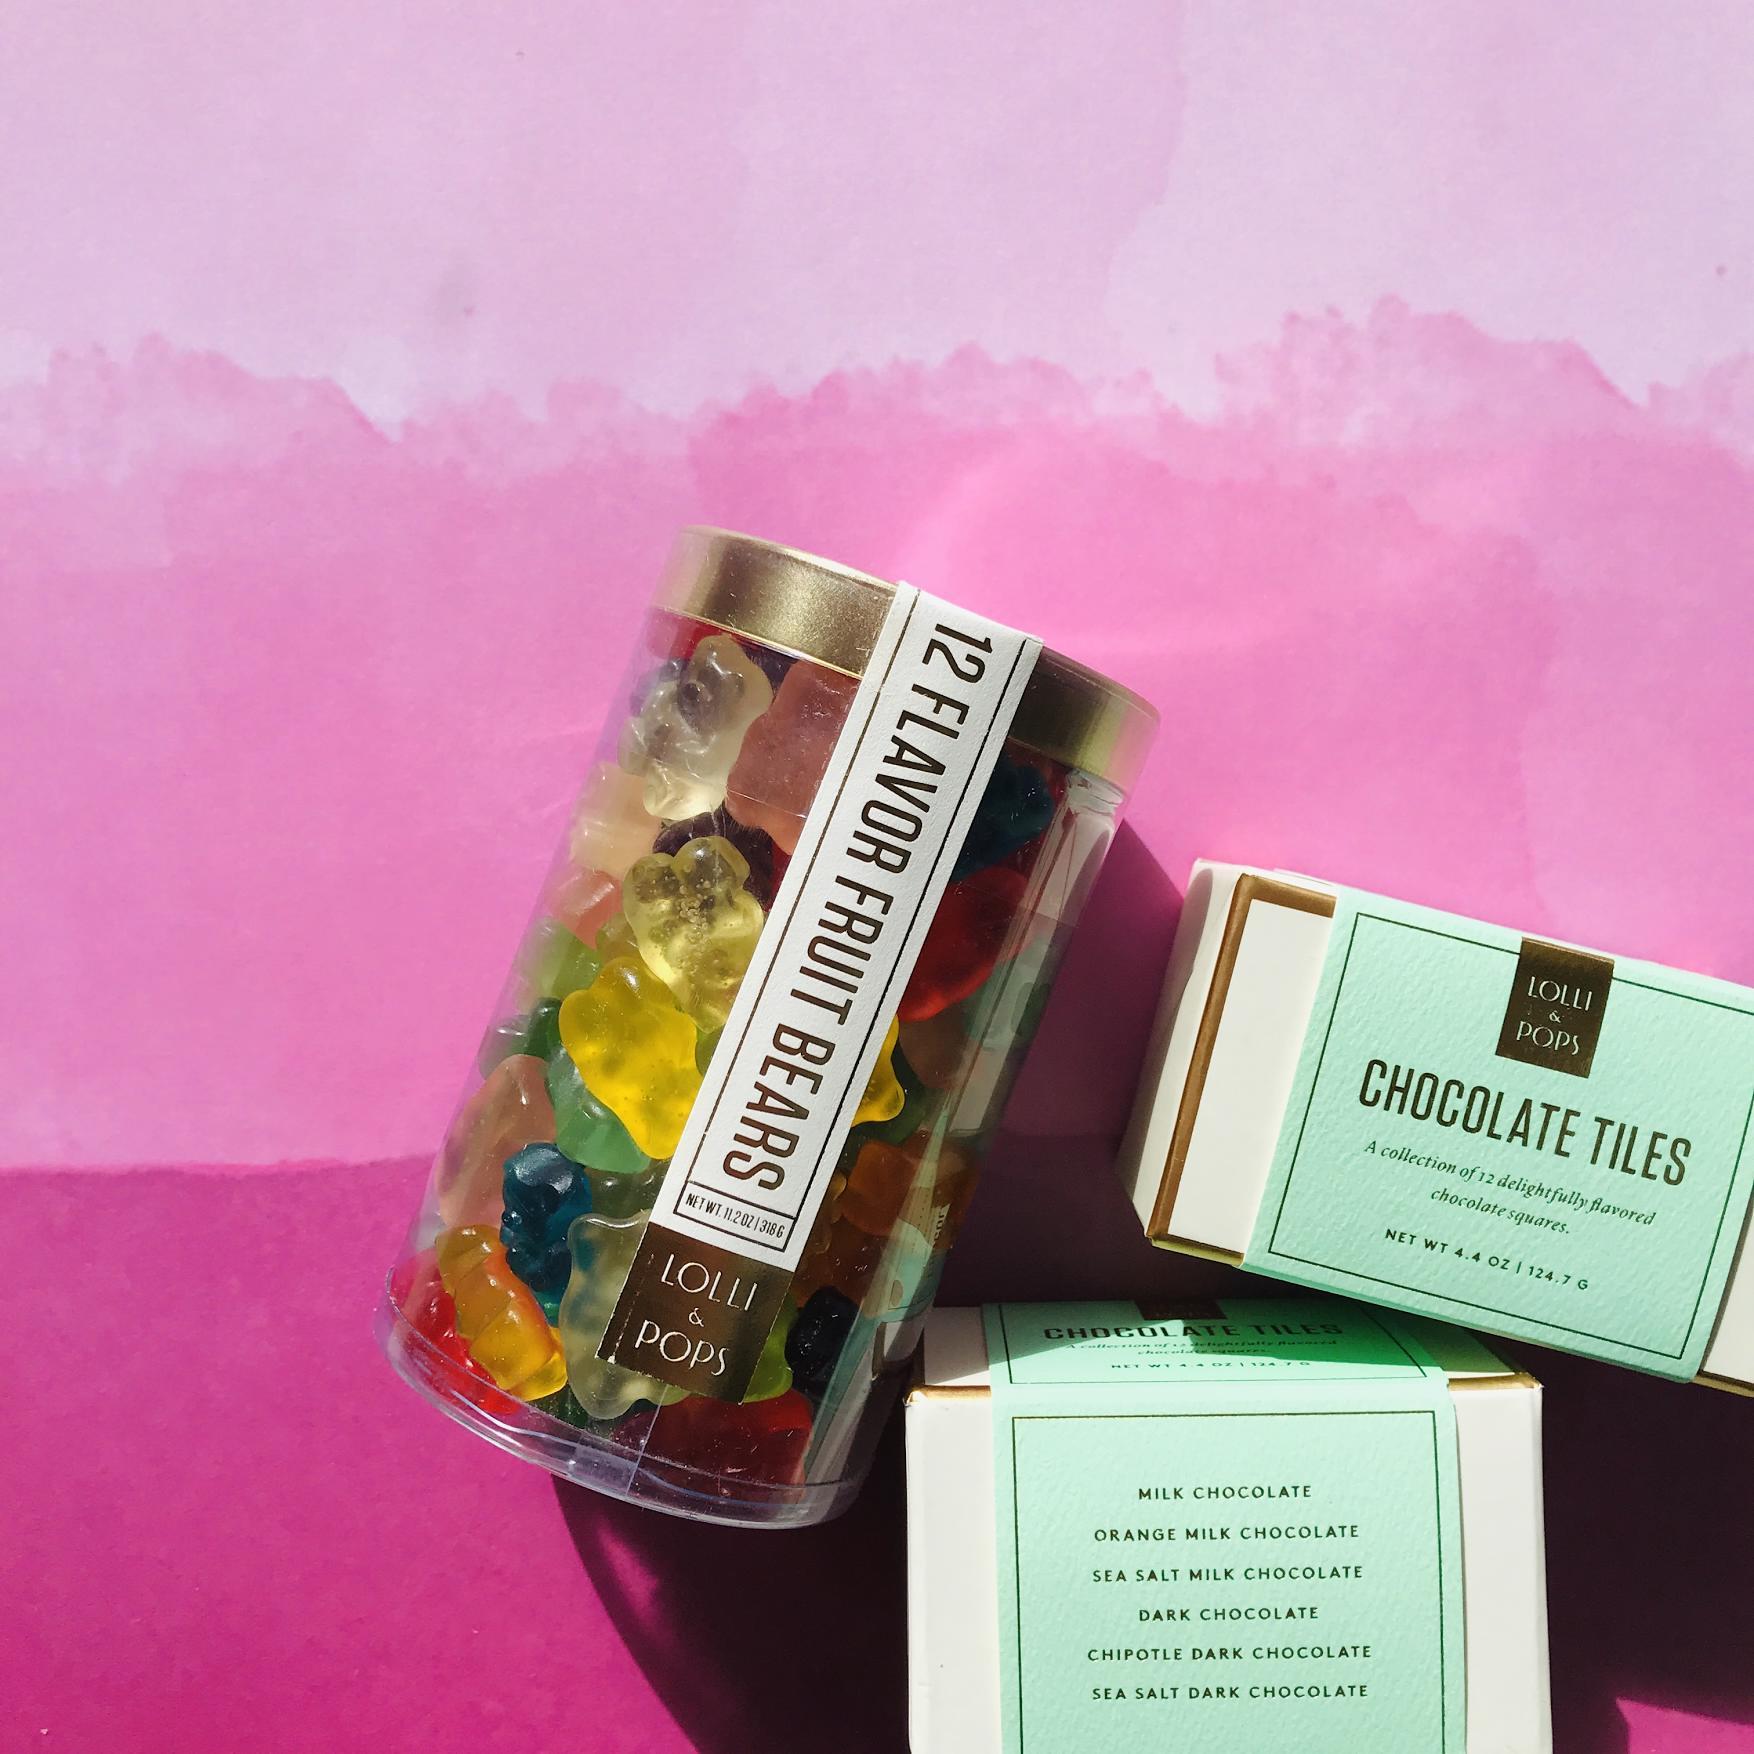 Gummi Bears and Chocolate squares